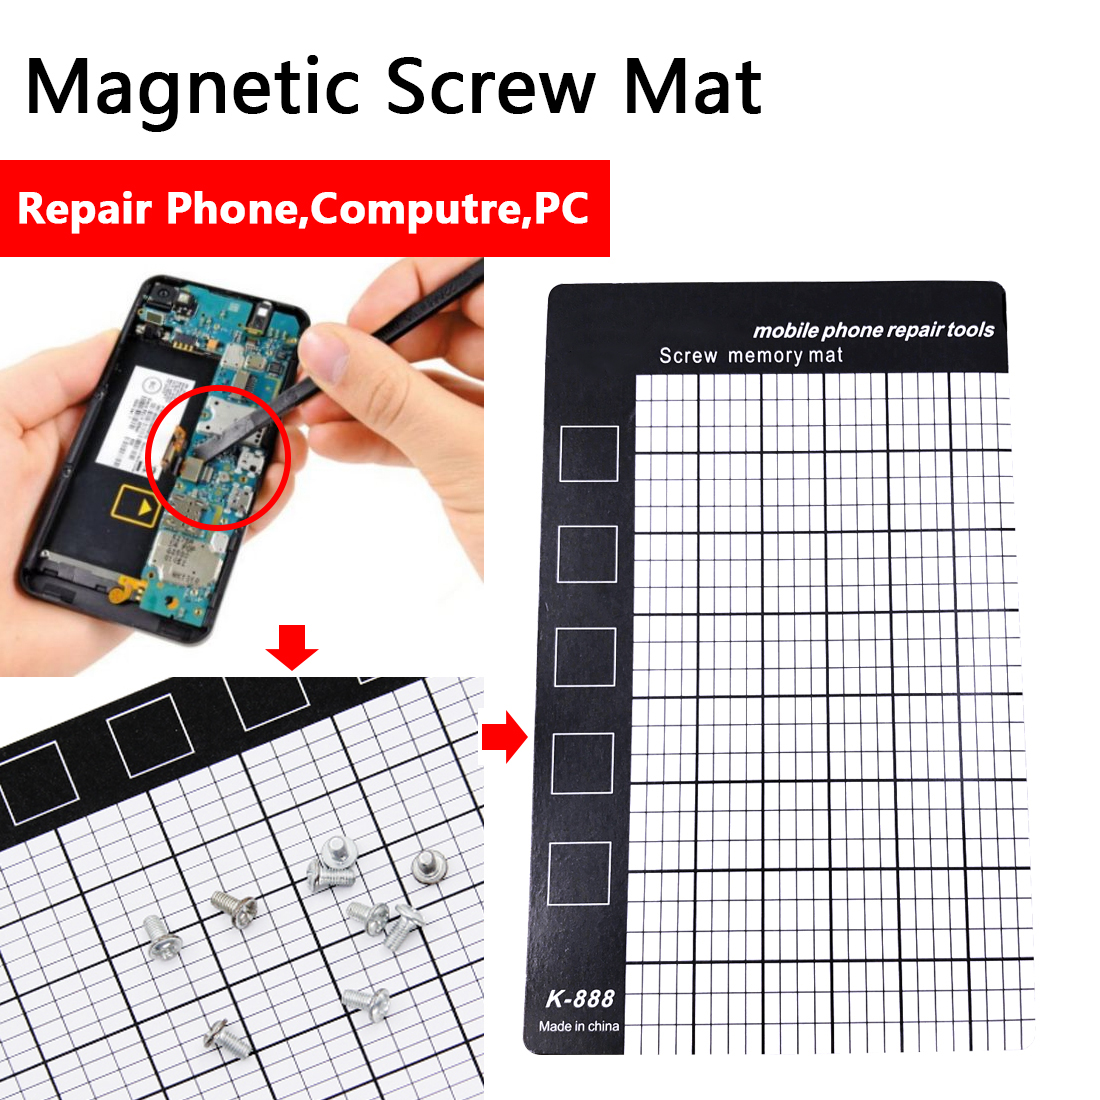 Screw Memory Mat White Magnetic Working Memory Pad Mobile Phone Repair Tools Palm Size 145 X 90mm